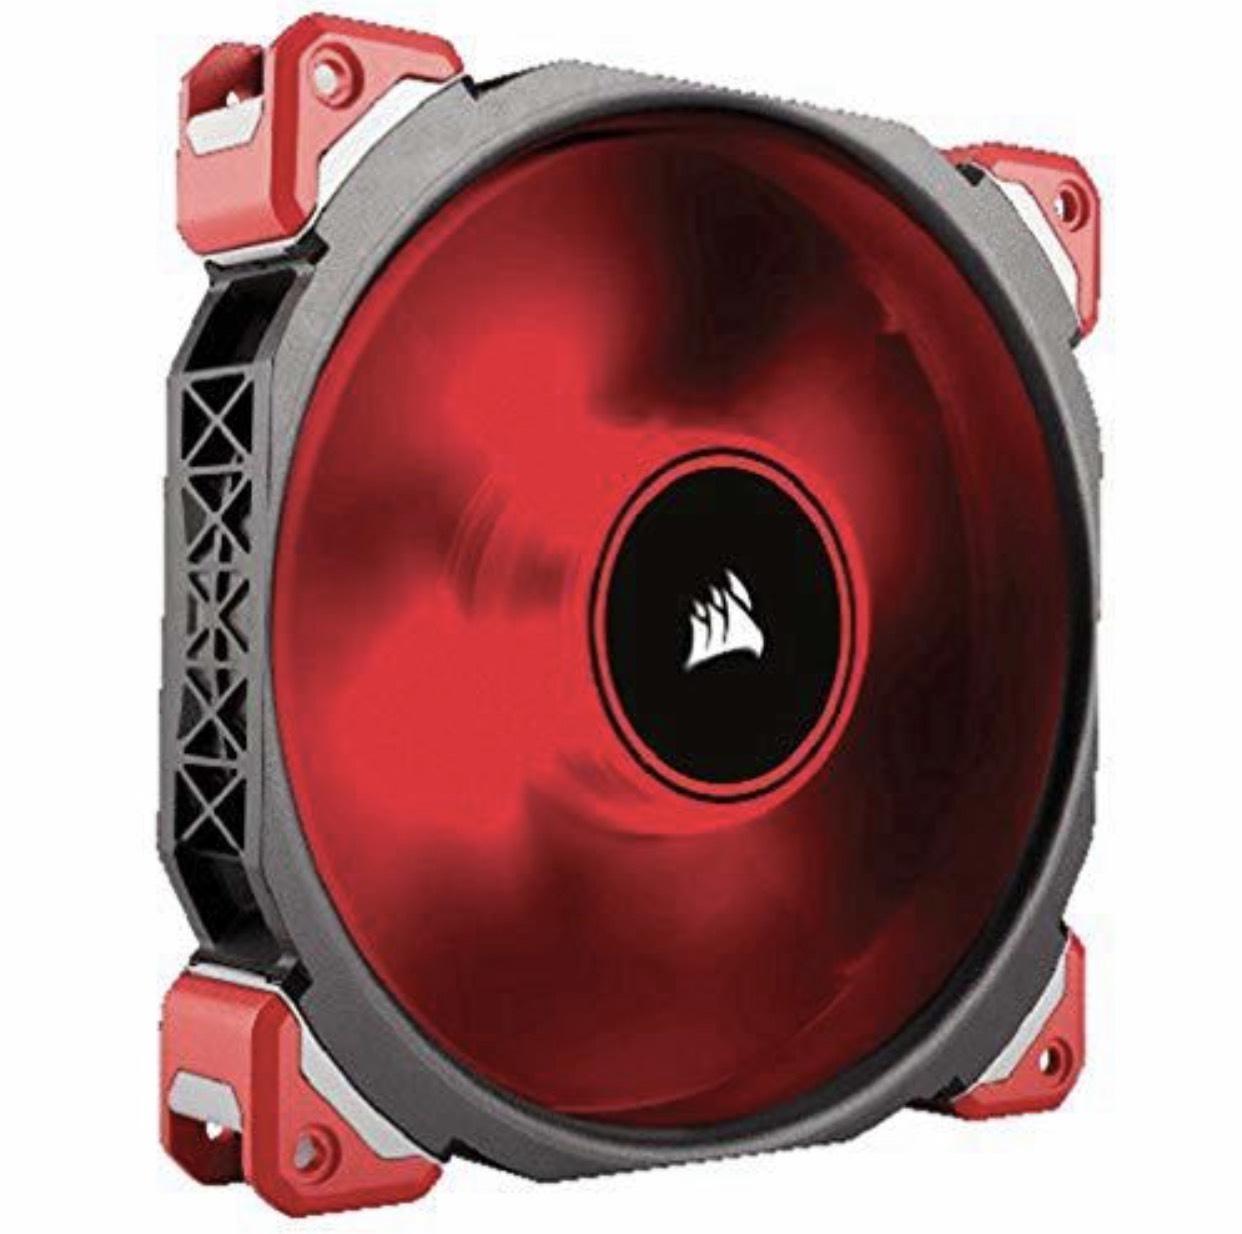 Corsair ML140 Pro LED PC-Gehäuselüfter in Blau,Rot oder Weiß